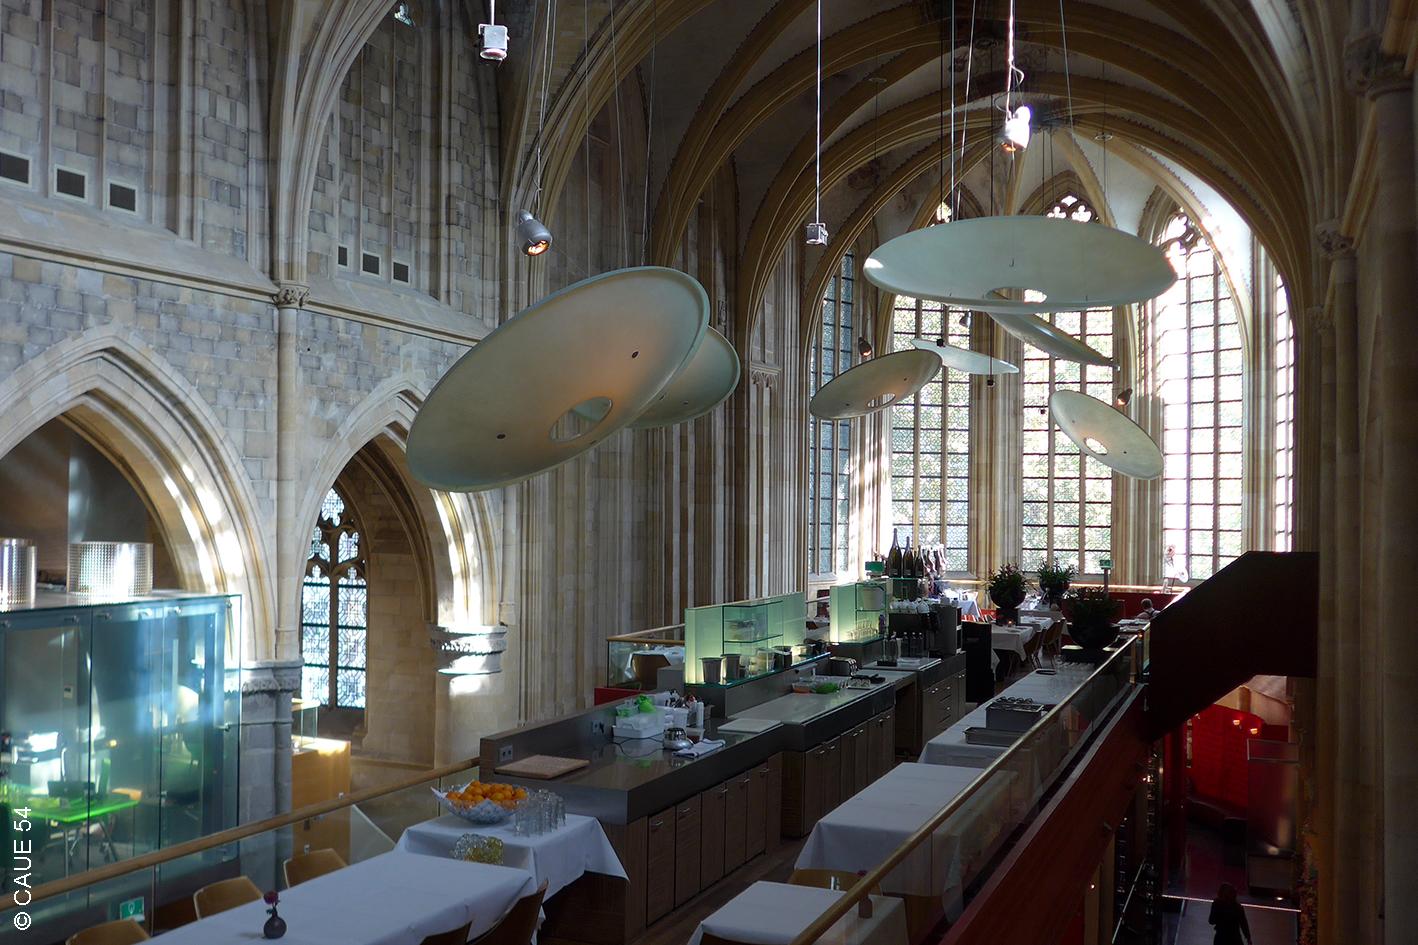 Kruisherenrestaurant - Maastricht - Pays-Bas